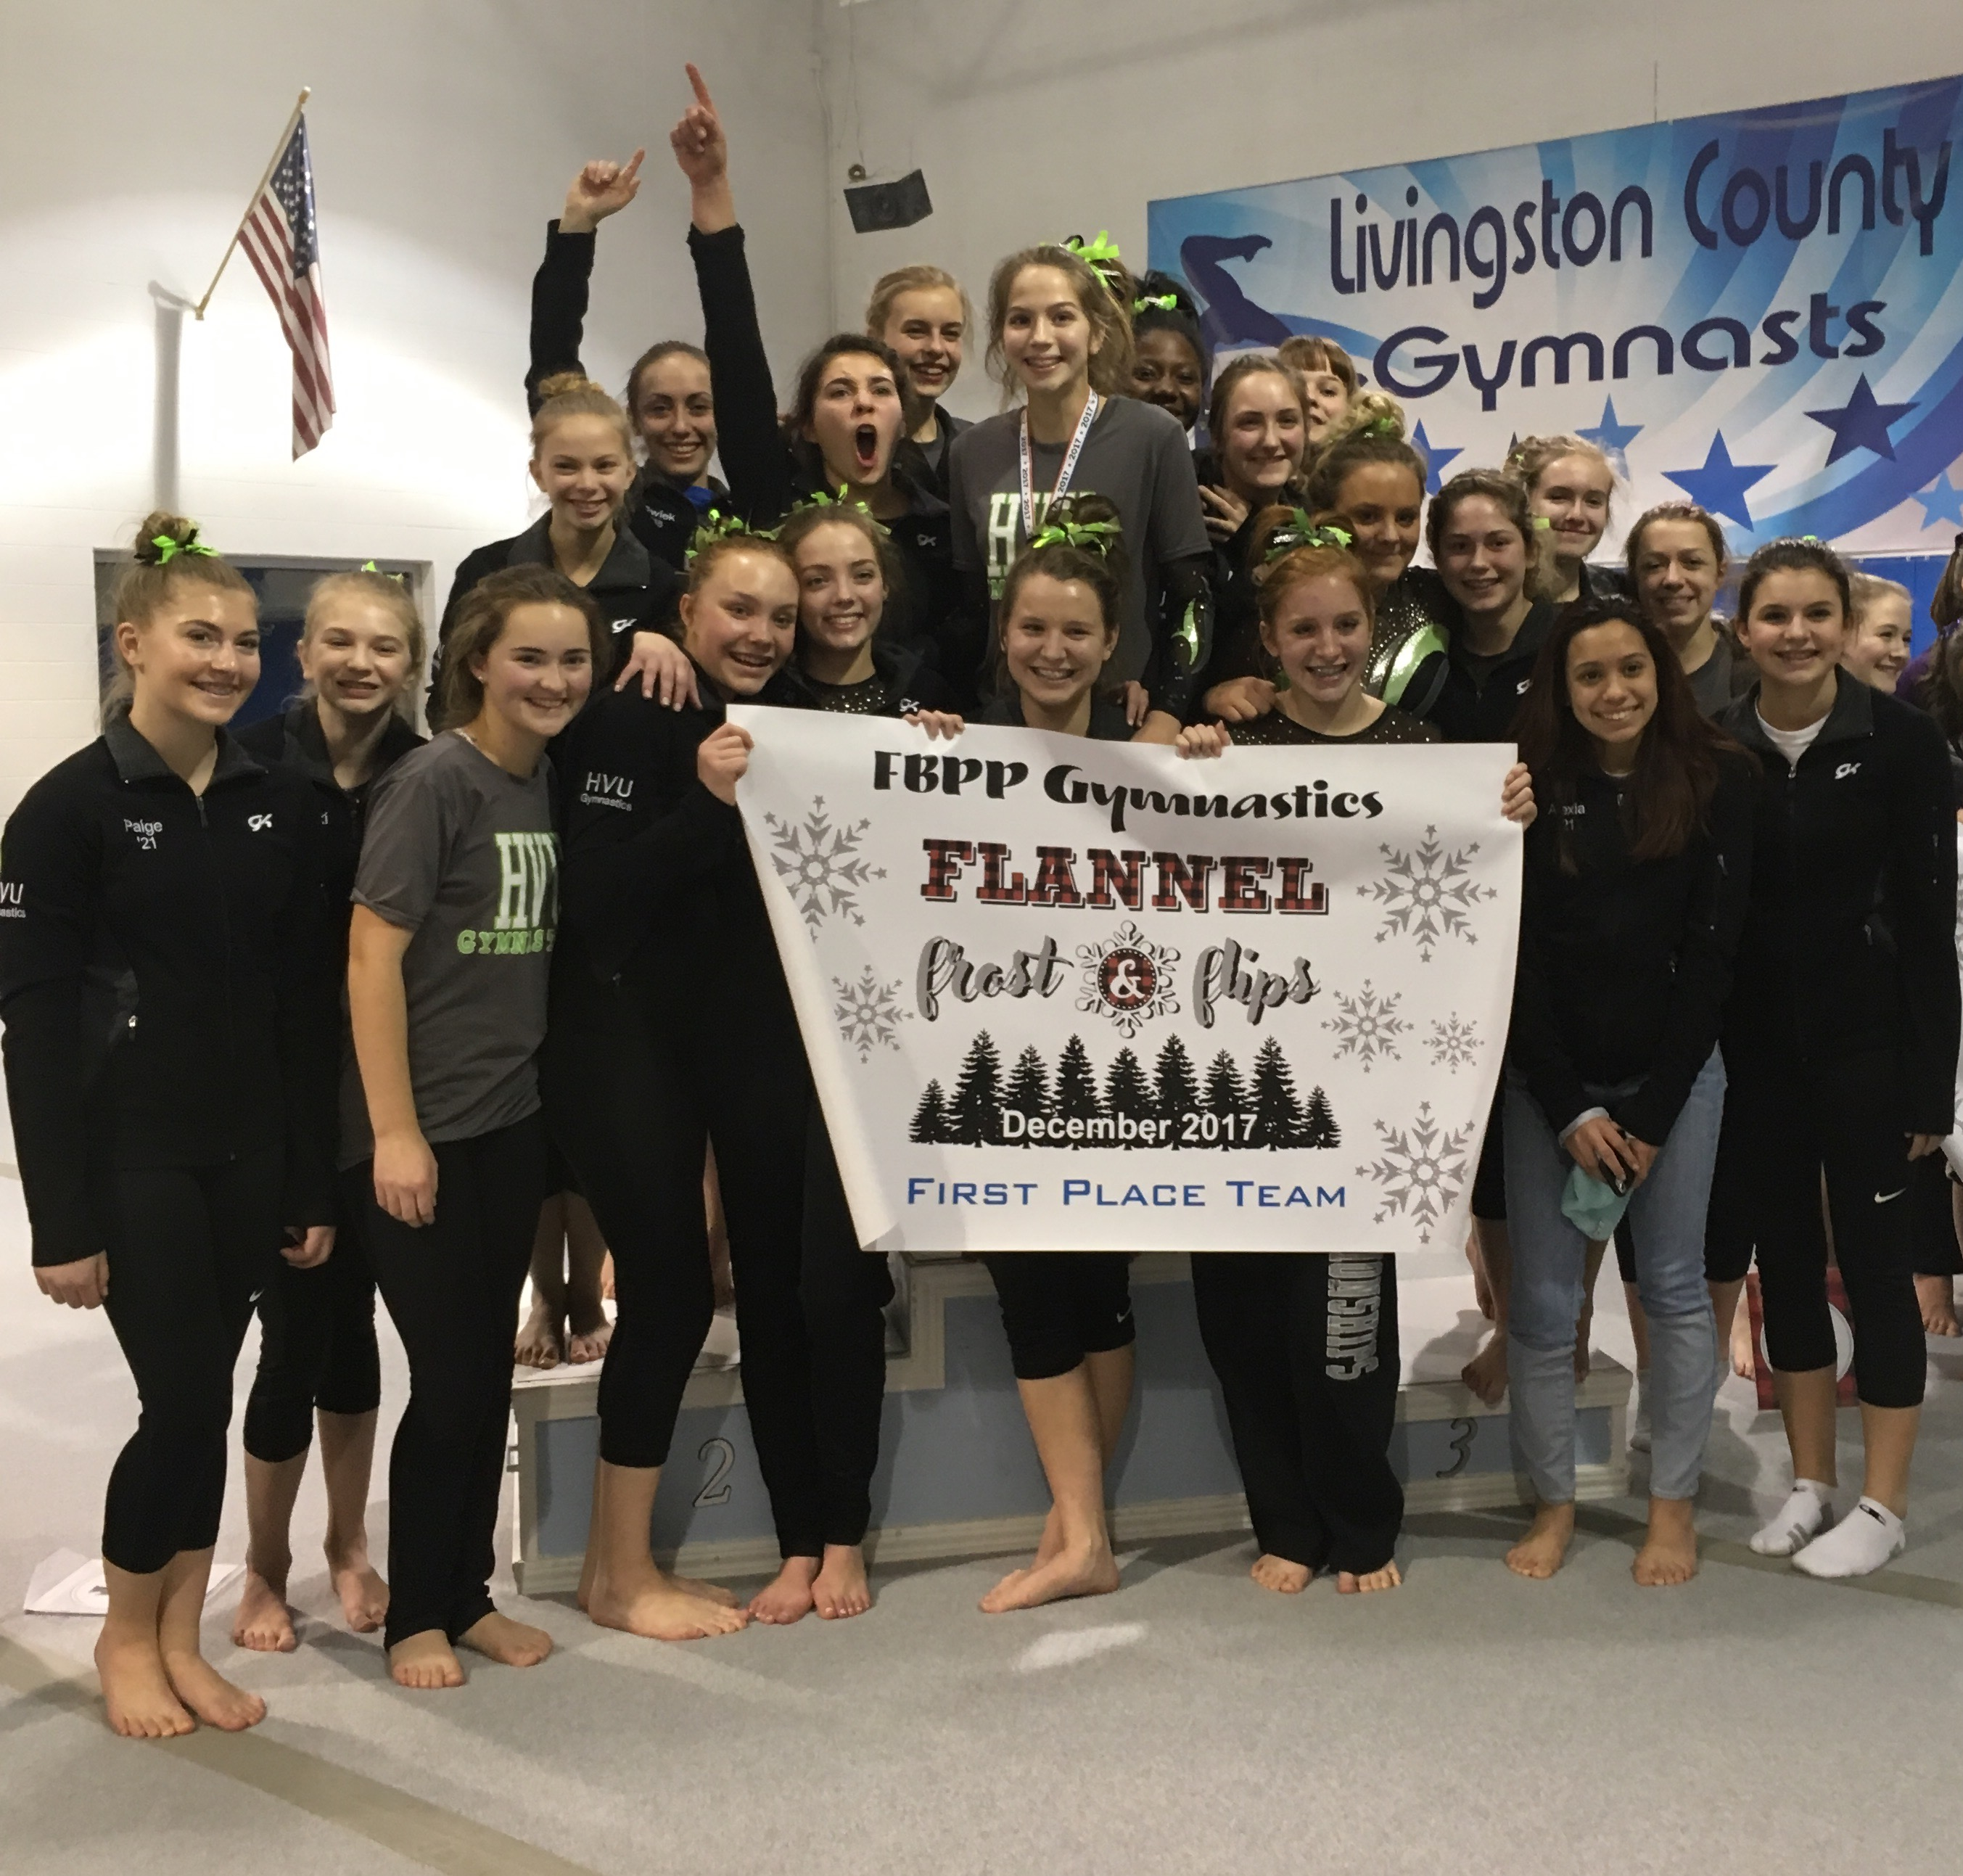 Huron Valley Gymnastics to Host Invitational at Lakeland High School